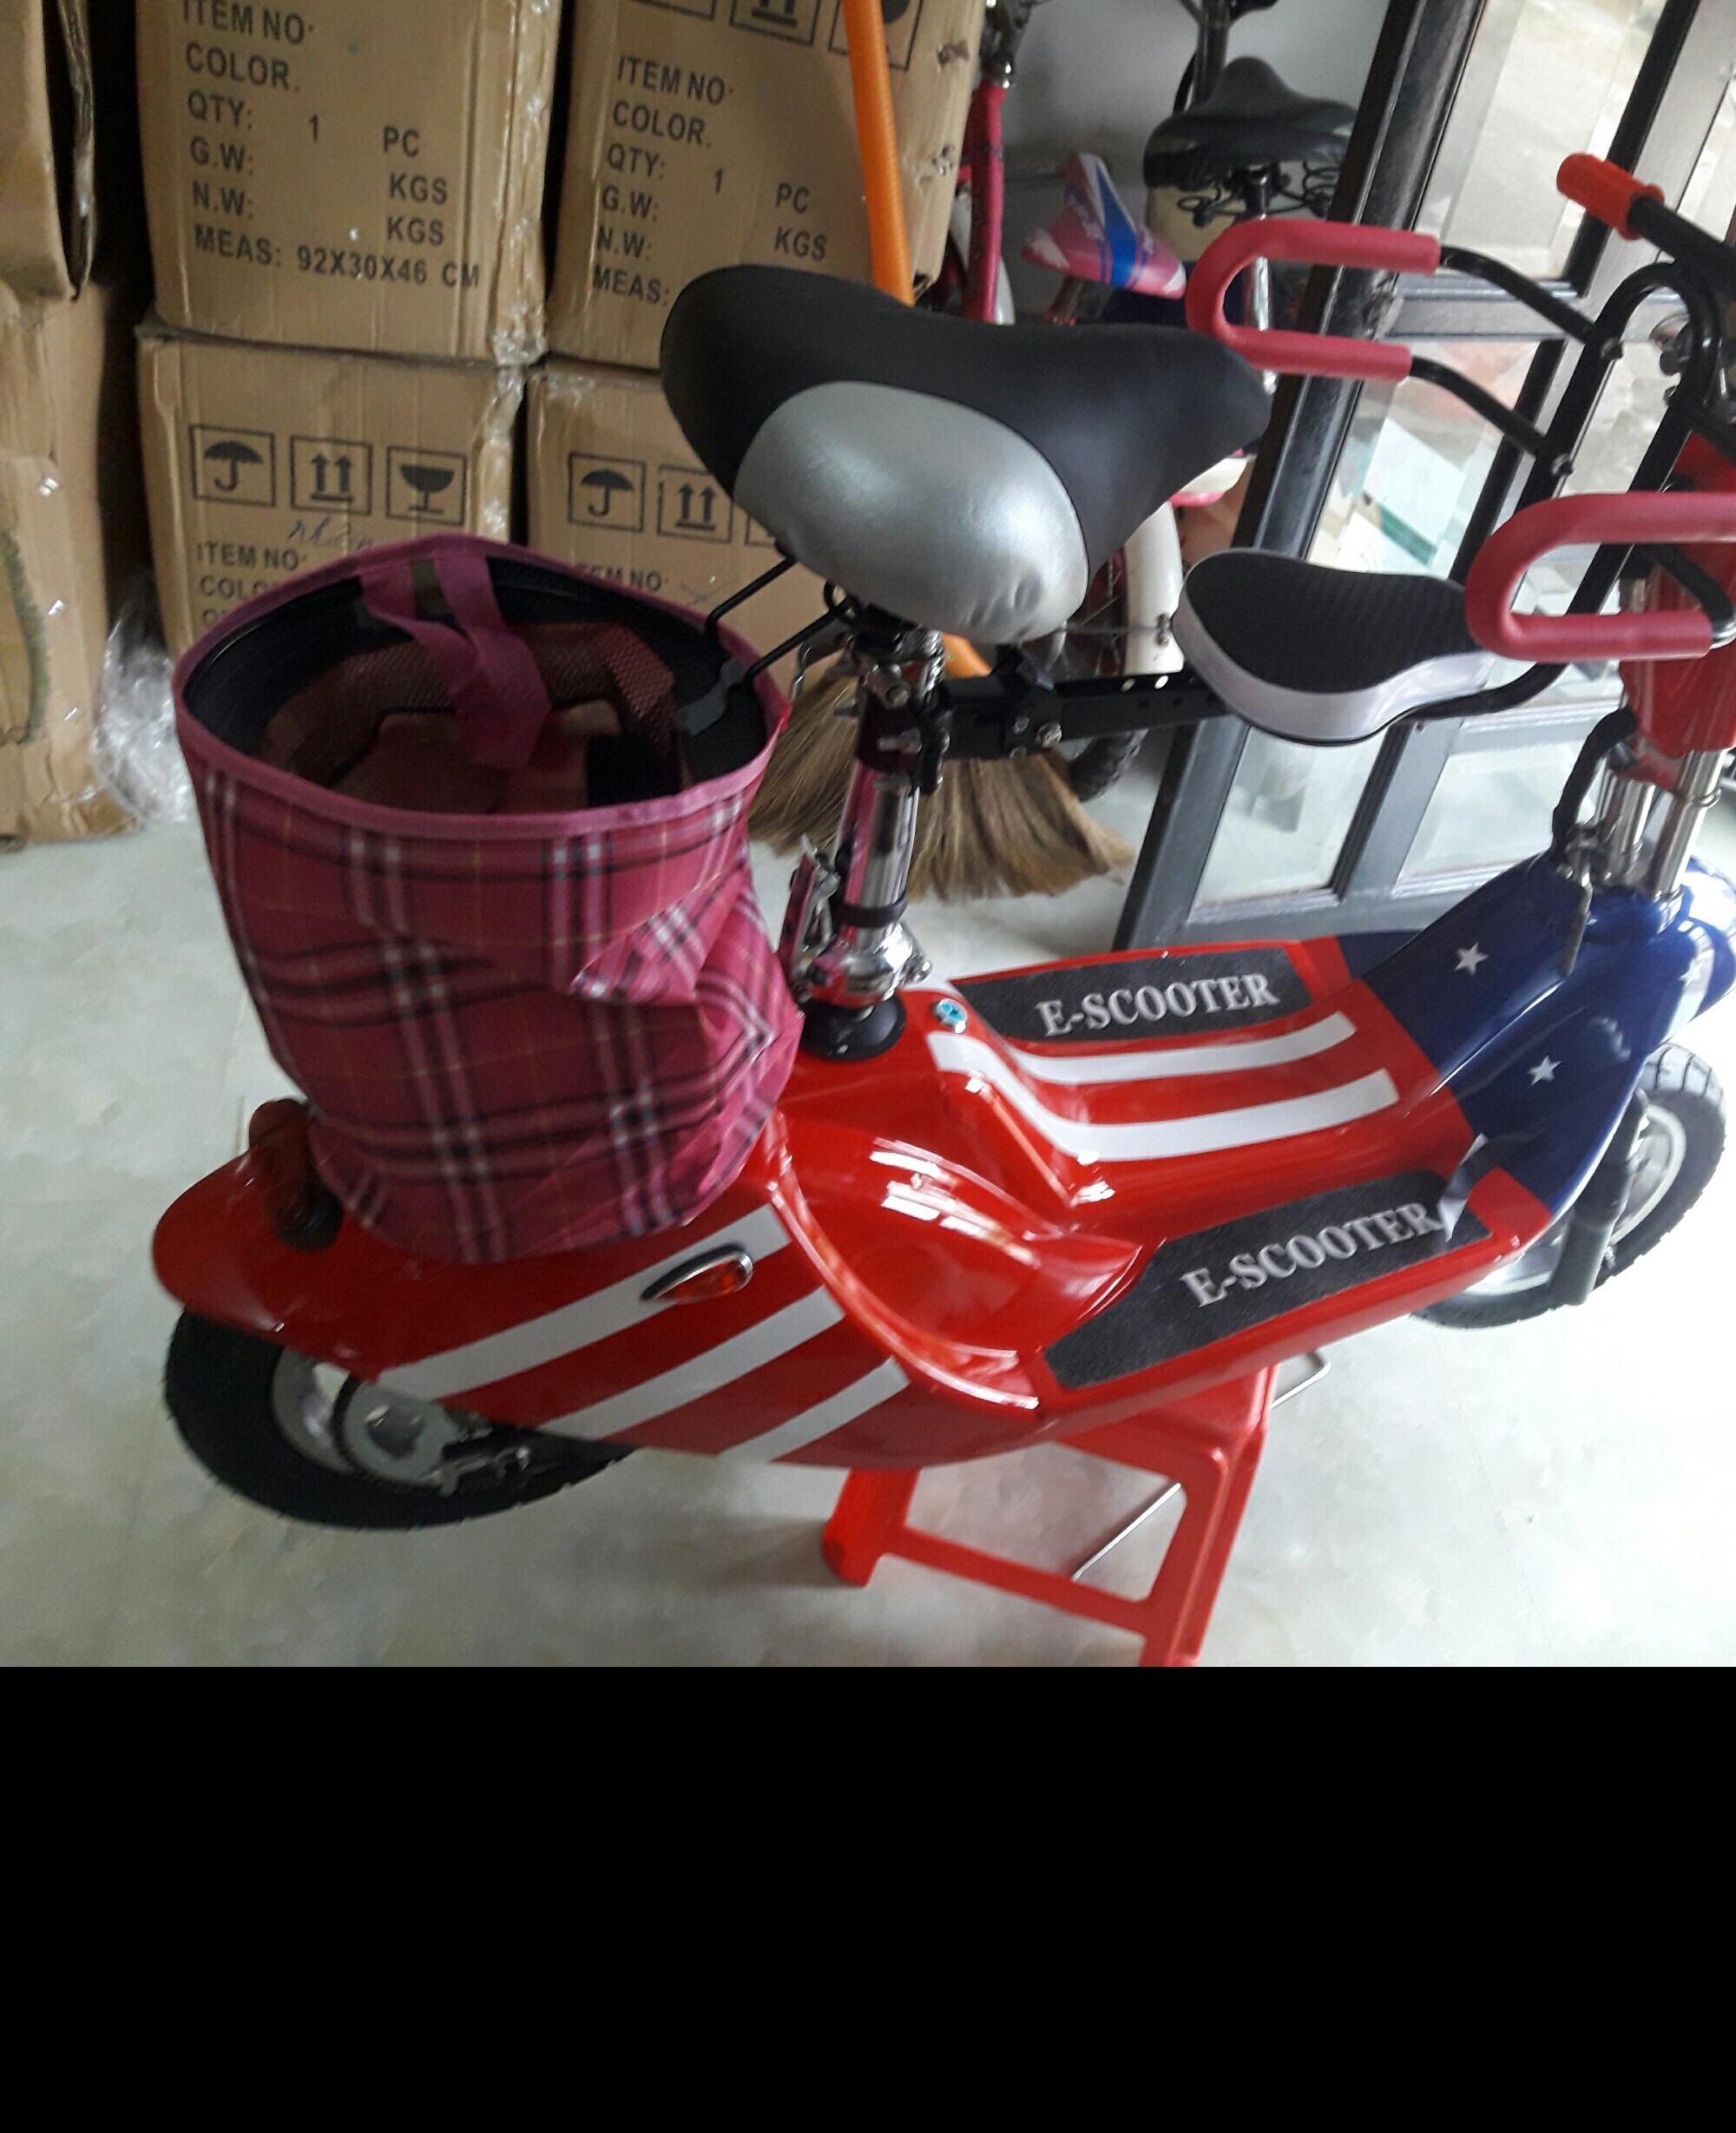 Giá bán Xe Scooter cao cấp 2019